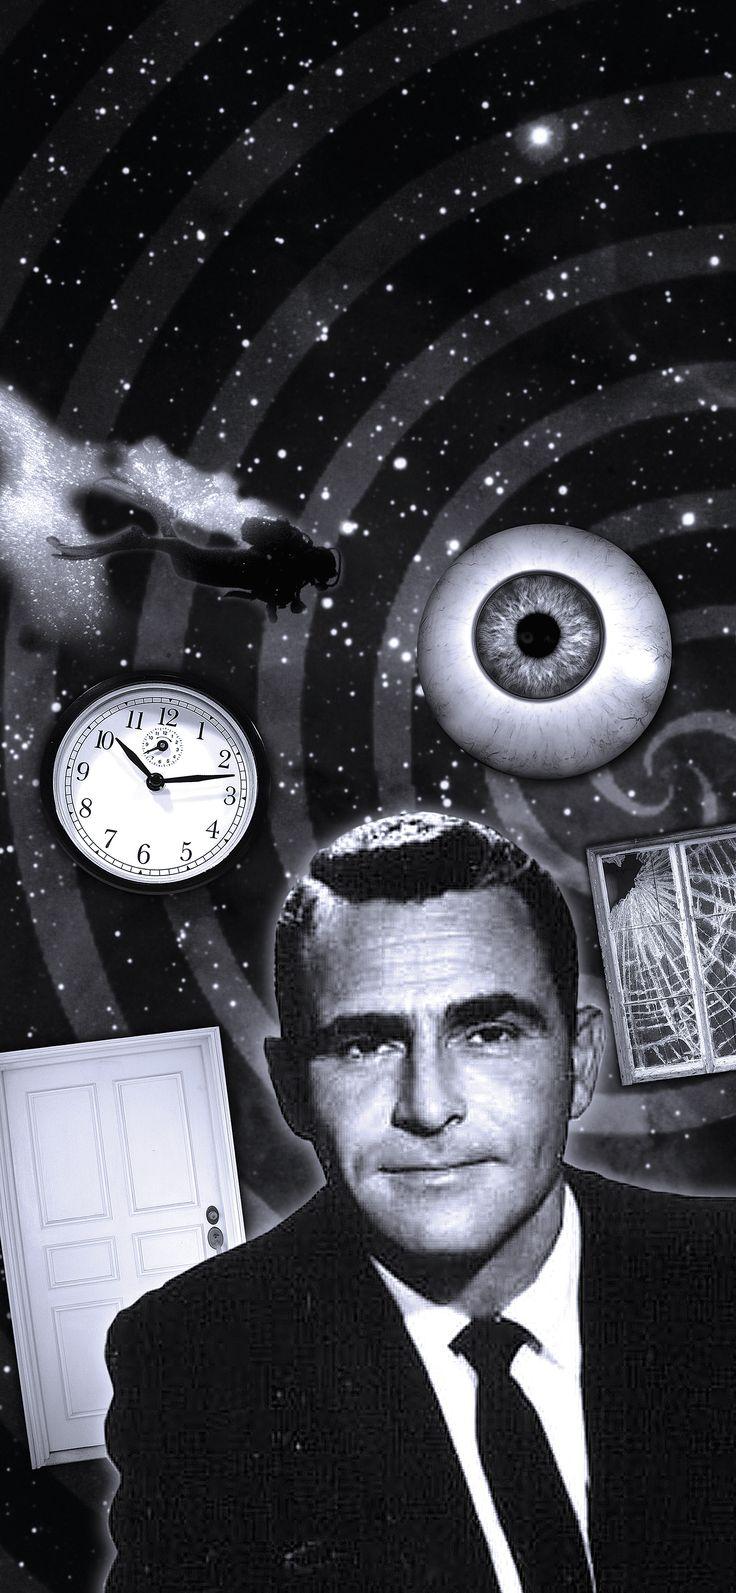 Rod Serling; The Twilight zone.